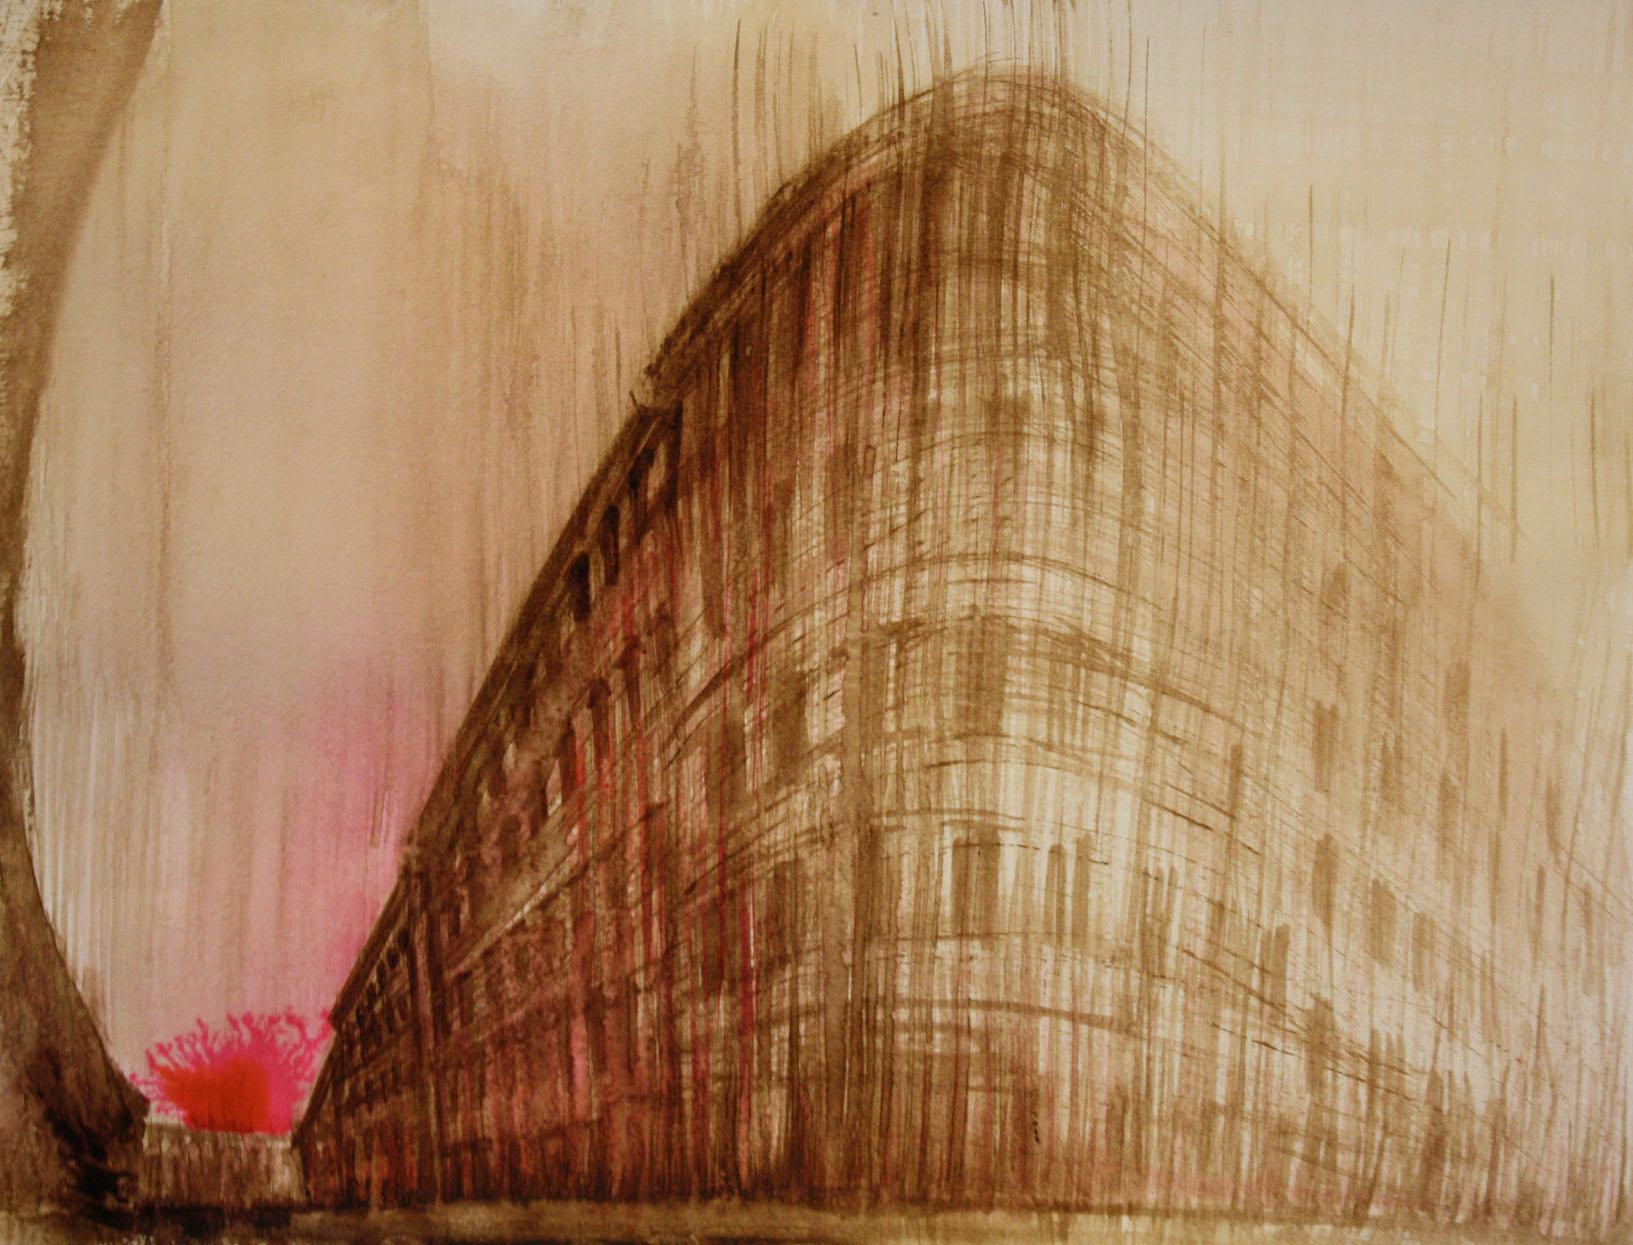 Laggiù, Trieste, 2010; bitume e china su carta, 23x30,5 cm.